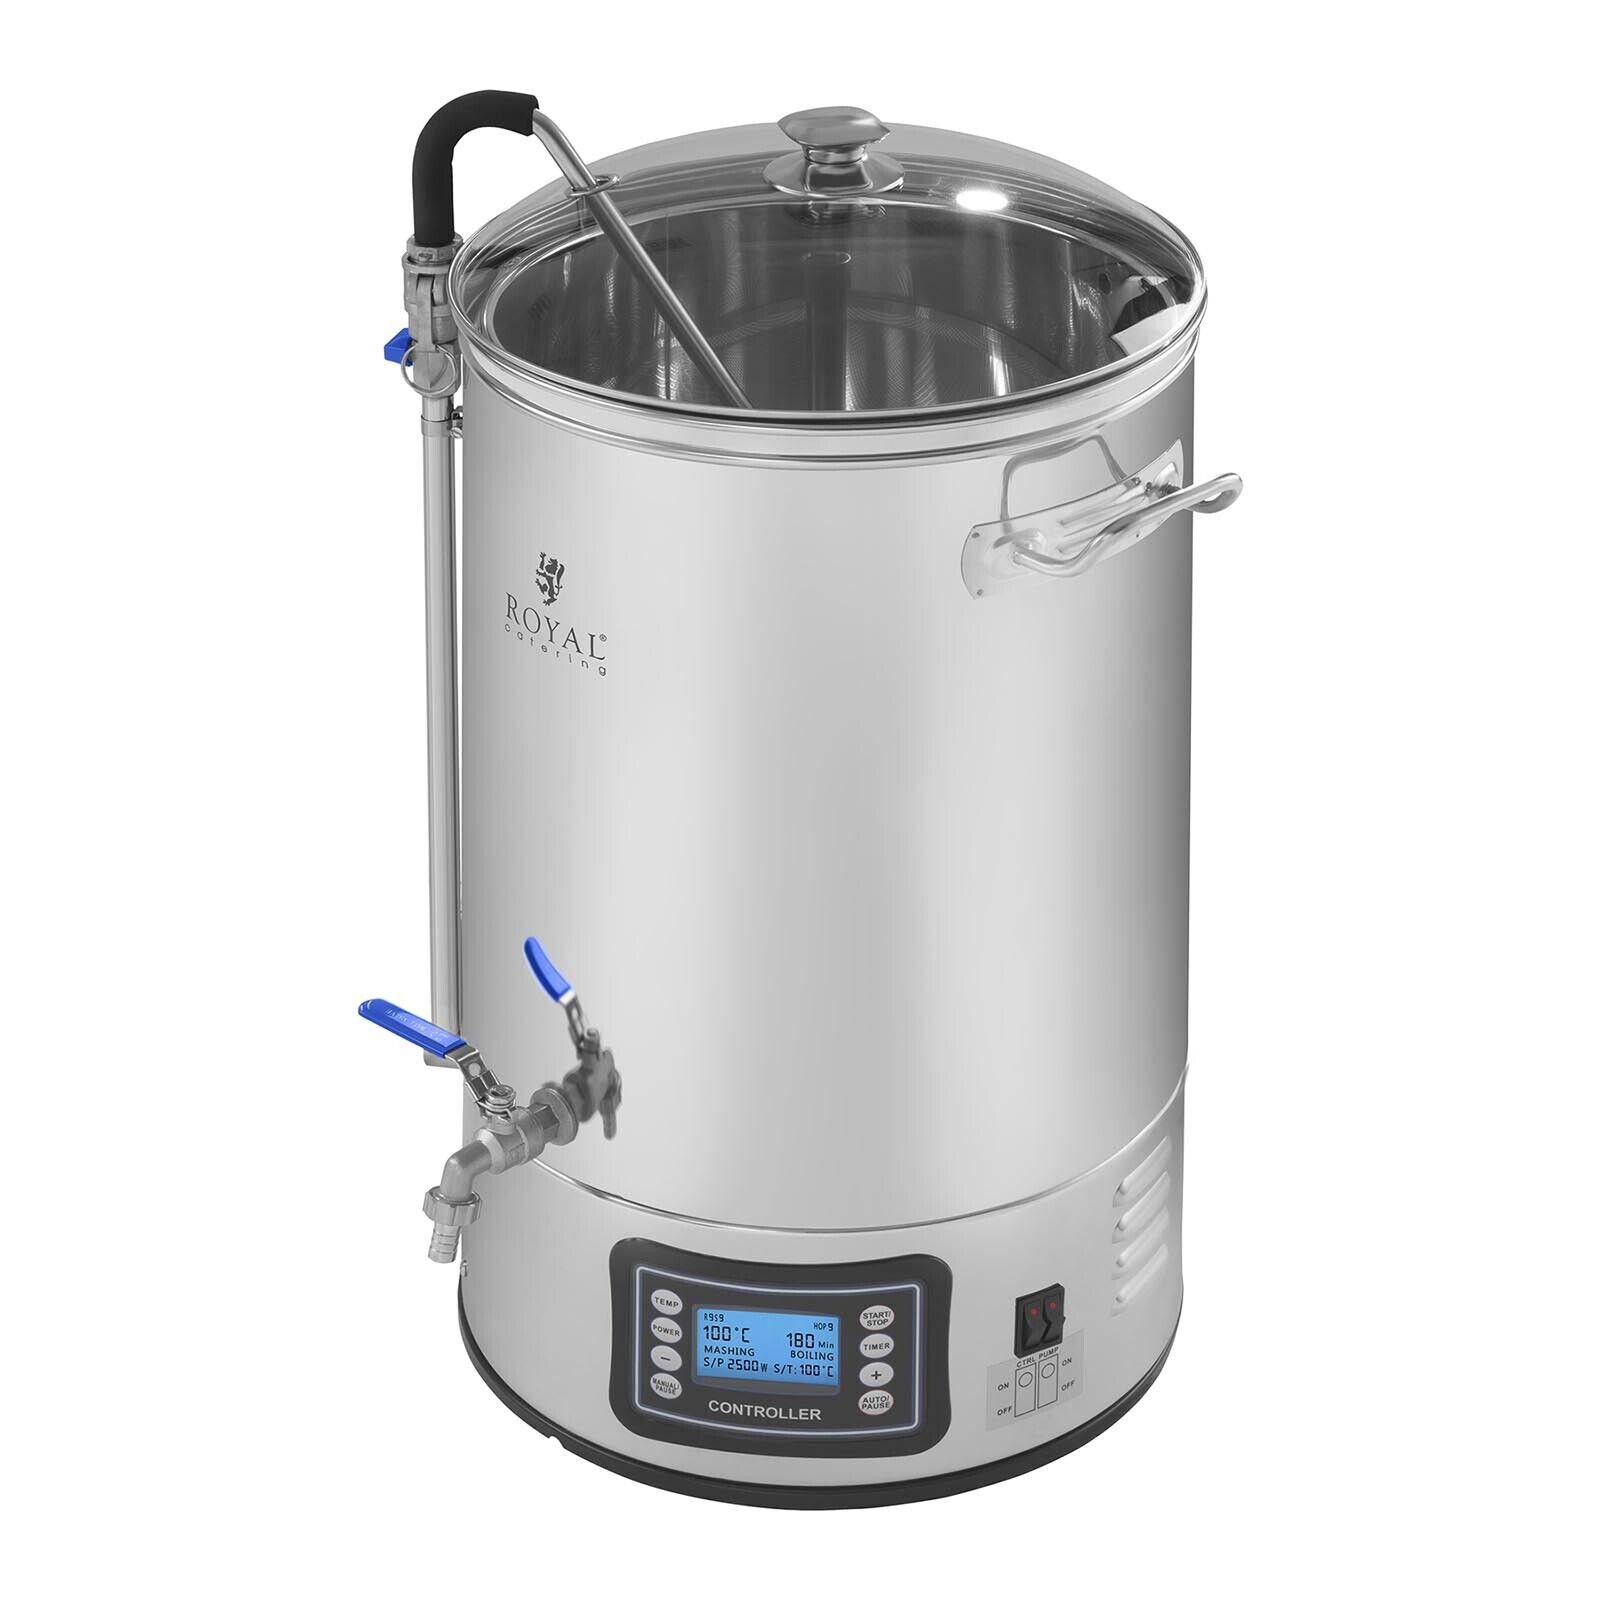 Kit brassage bière Cuve de fermentation Homebrew 40L Ecran Minuterie 2500W inox